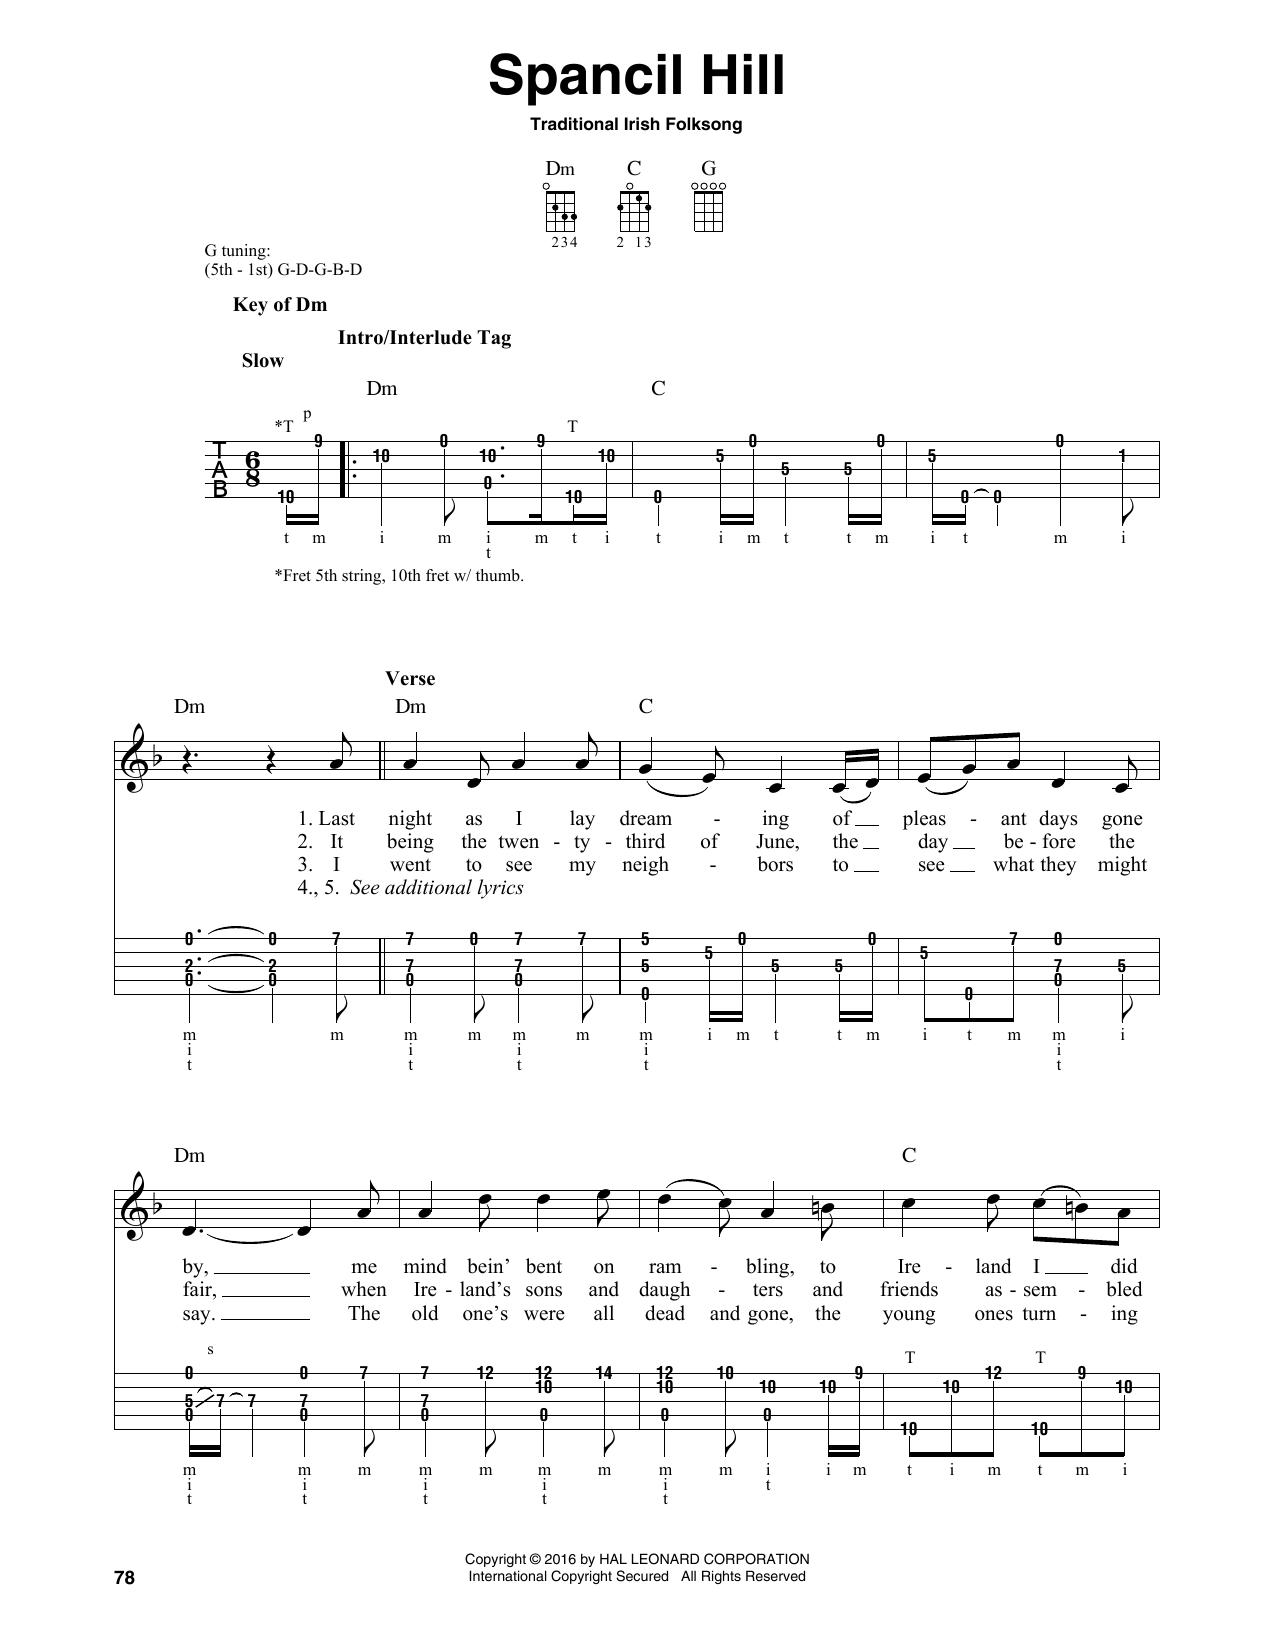 Traditional Irish Folk Song 'Spancil Hill' Sheet Music Notes, Chords    Download Printable Banjo - SKU: 165794